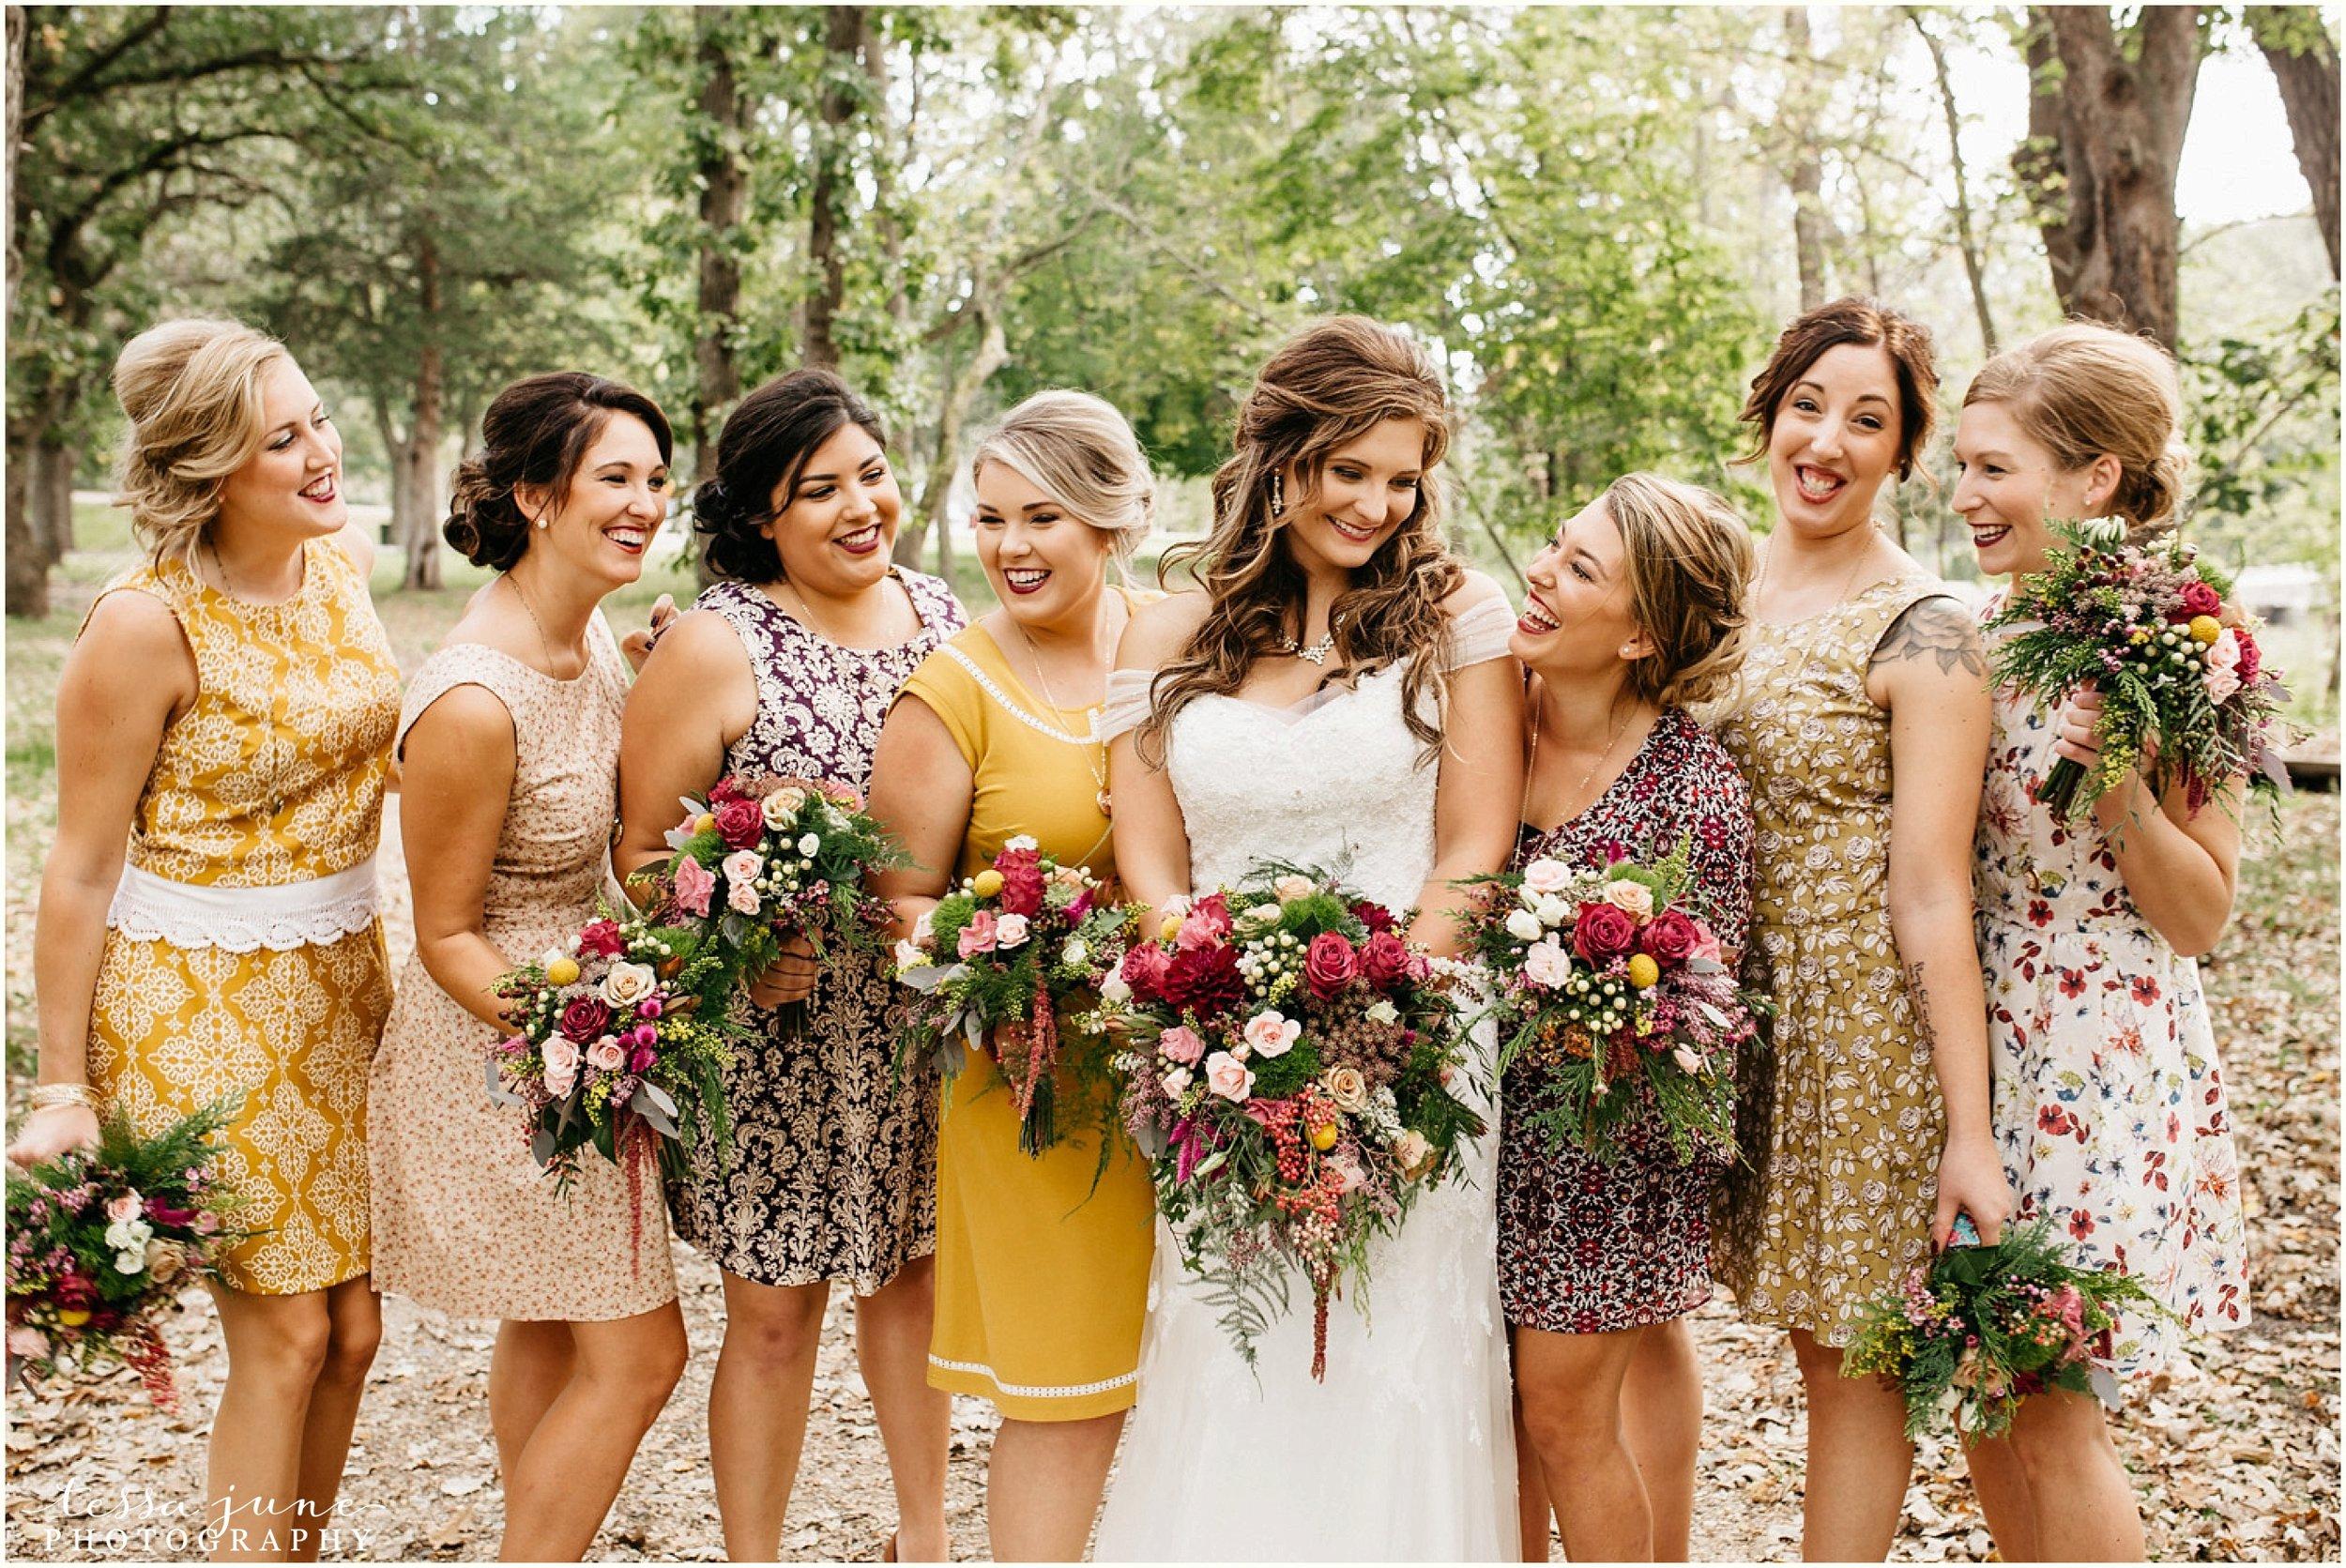 bohemian-minnesota-wedding-mismatched-bridesmaid-dresses-waterfall-st-cloud-tessa-june-photography-75.jpg